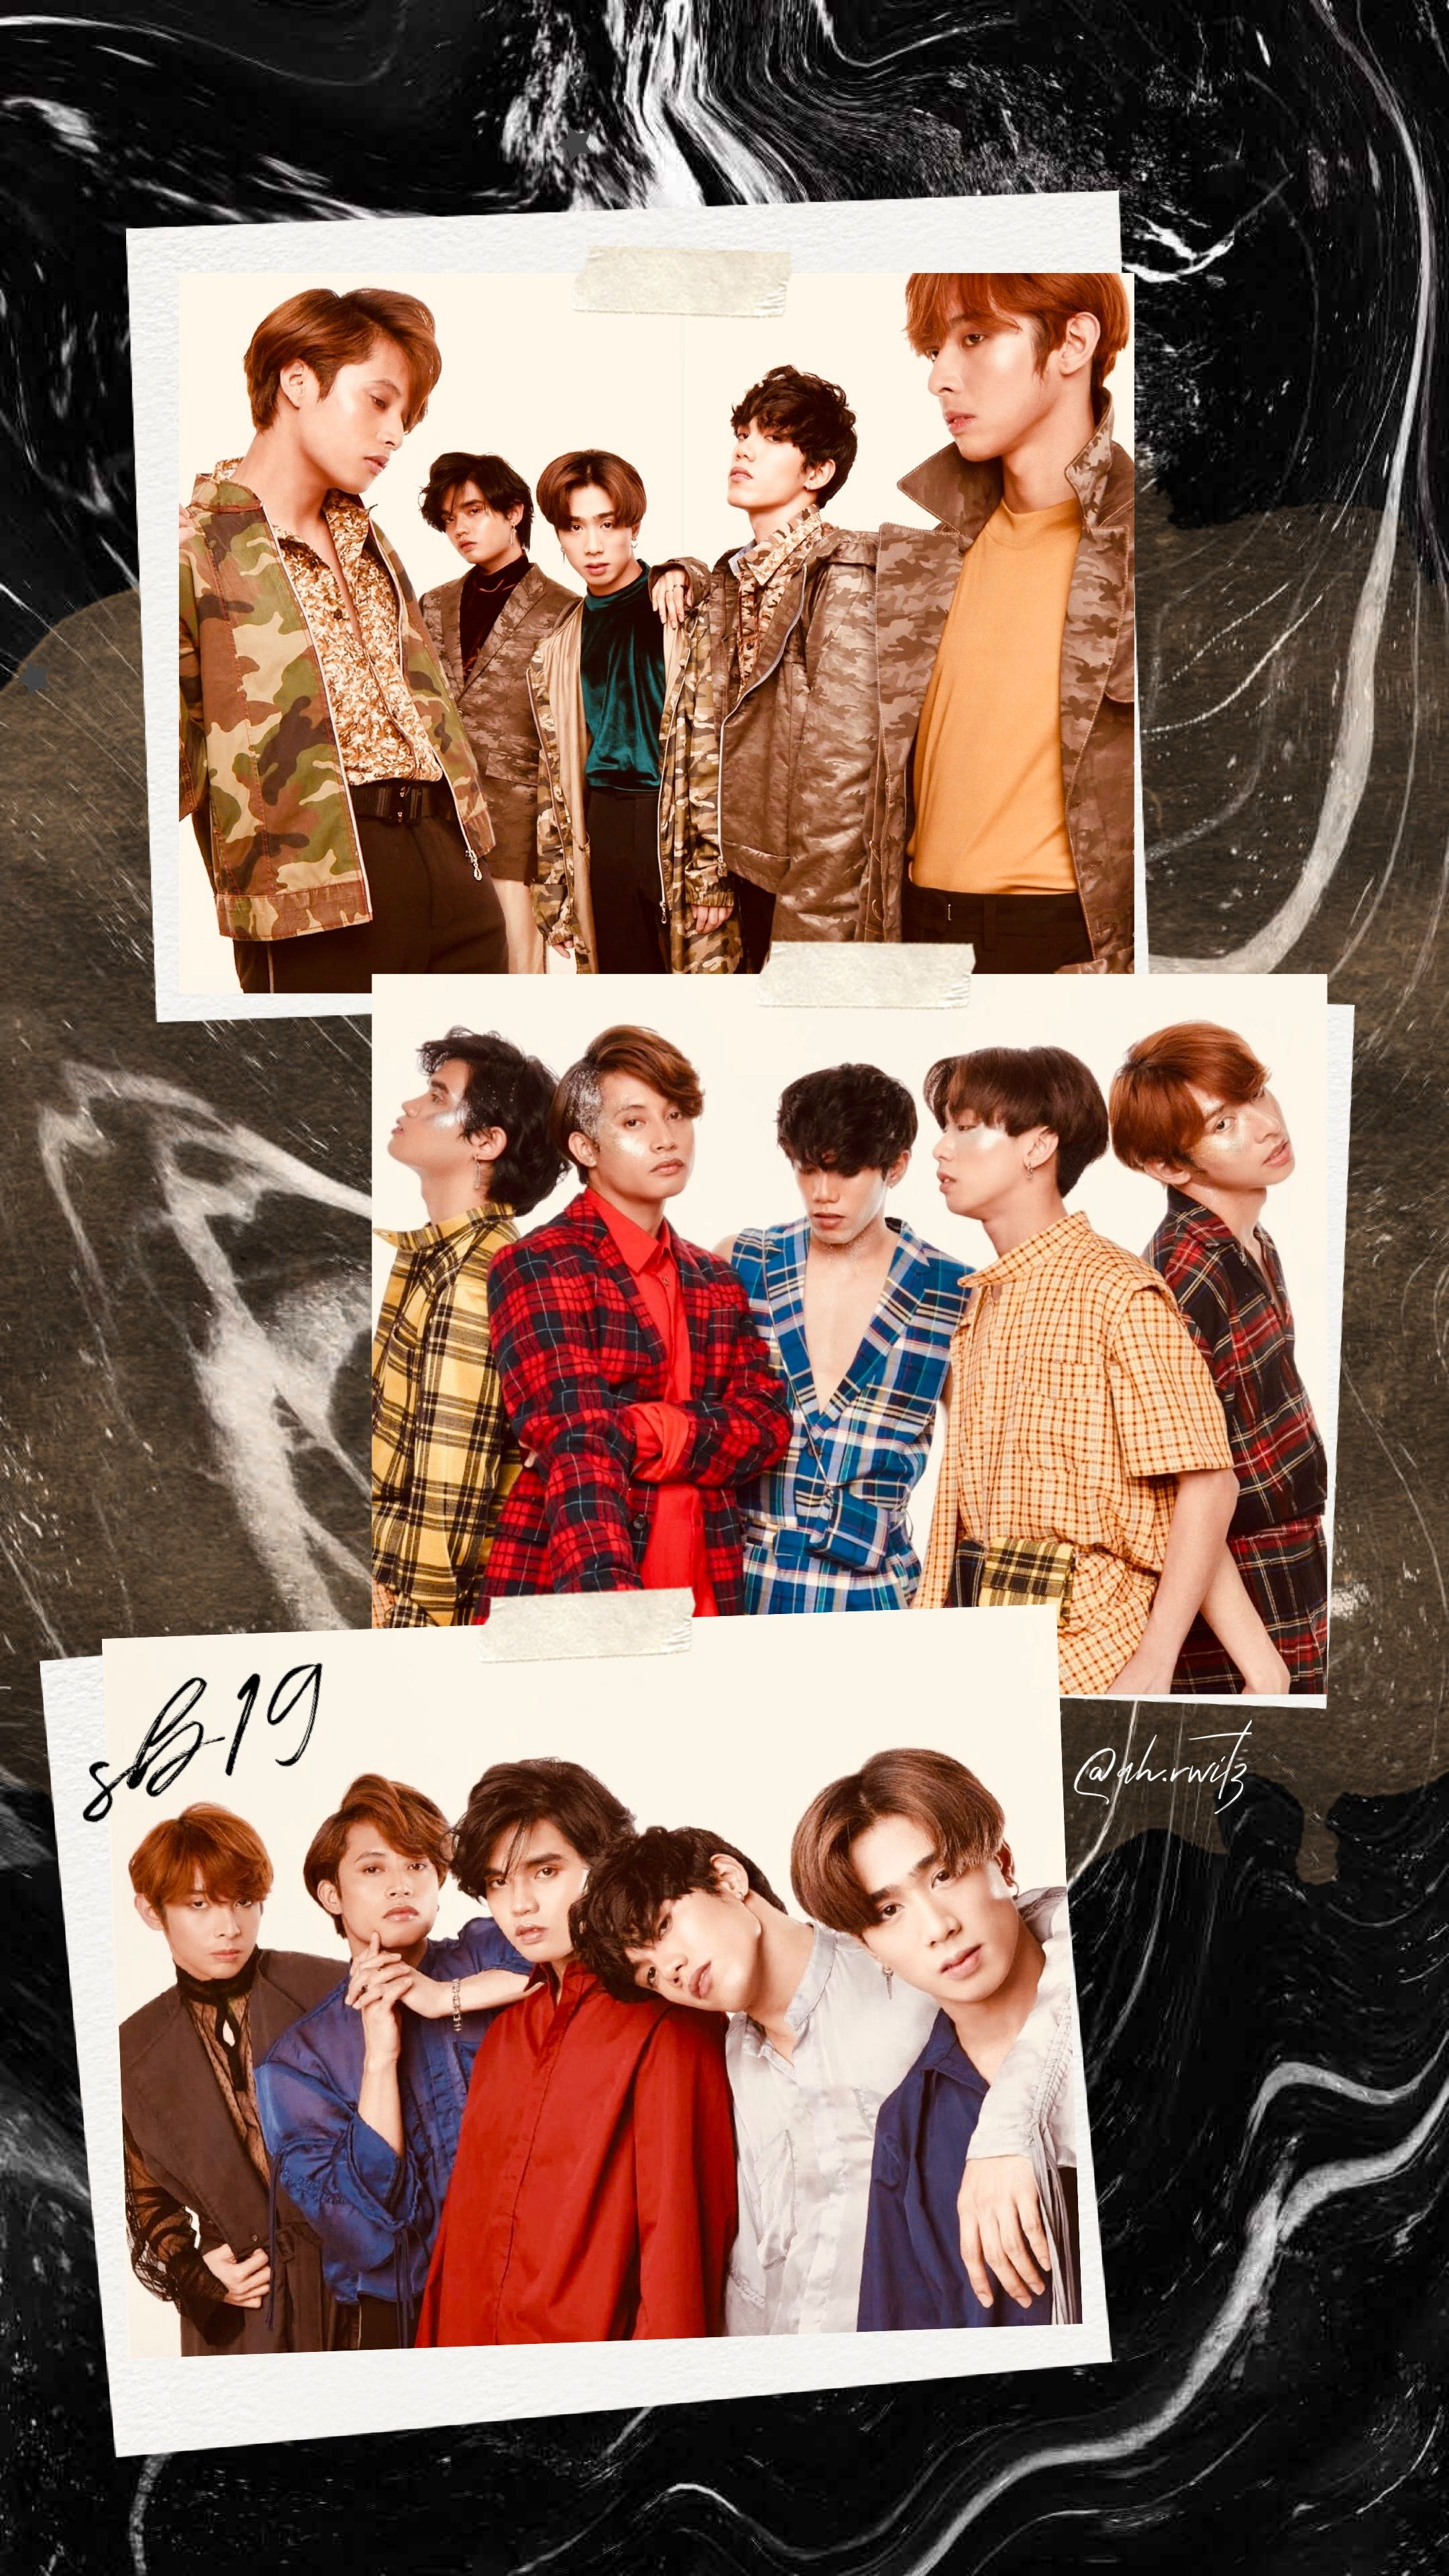 SB19 Wallpaper in 2020 Korean entertainment companies